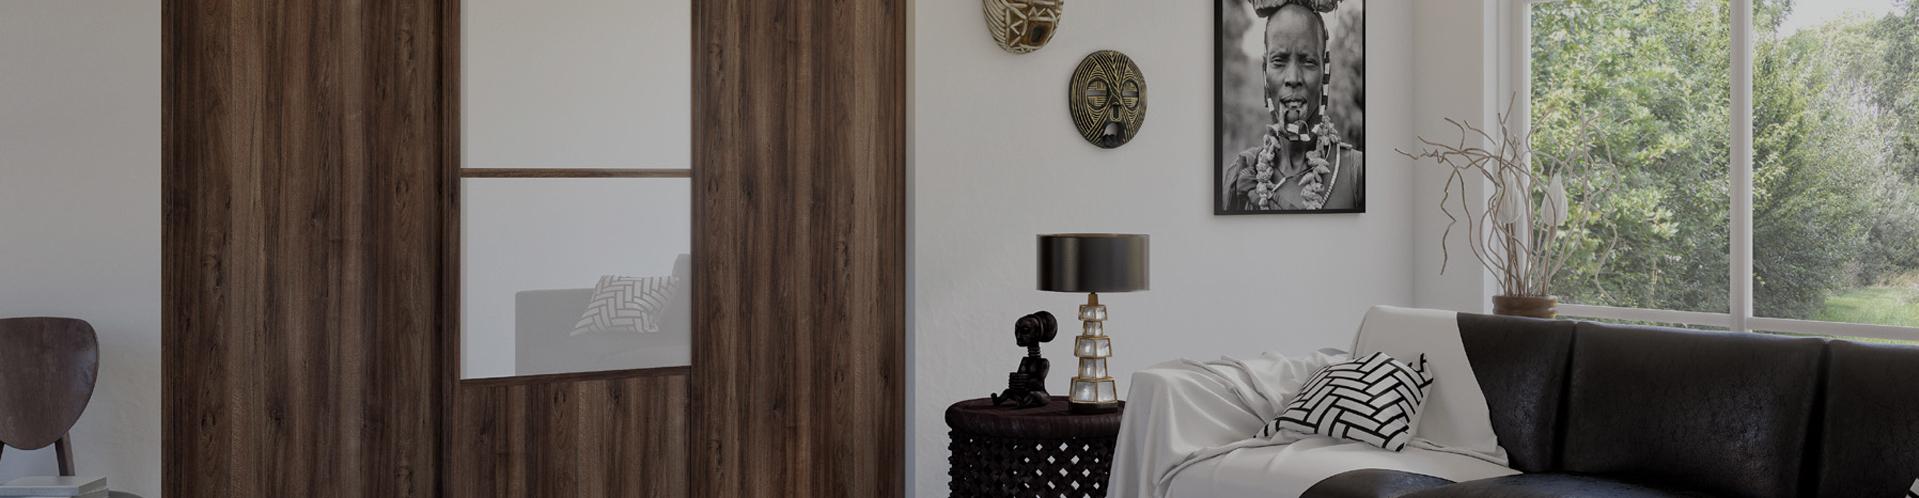 kazed chez vous kazed. Black Bedroom Furniture Sets. Home Design Ideas